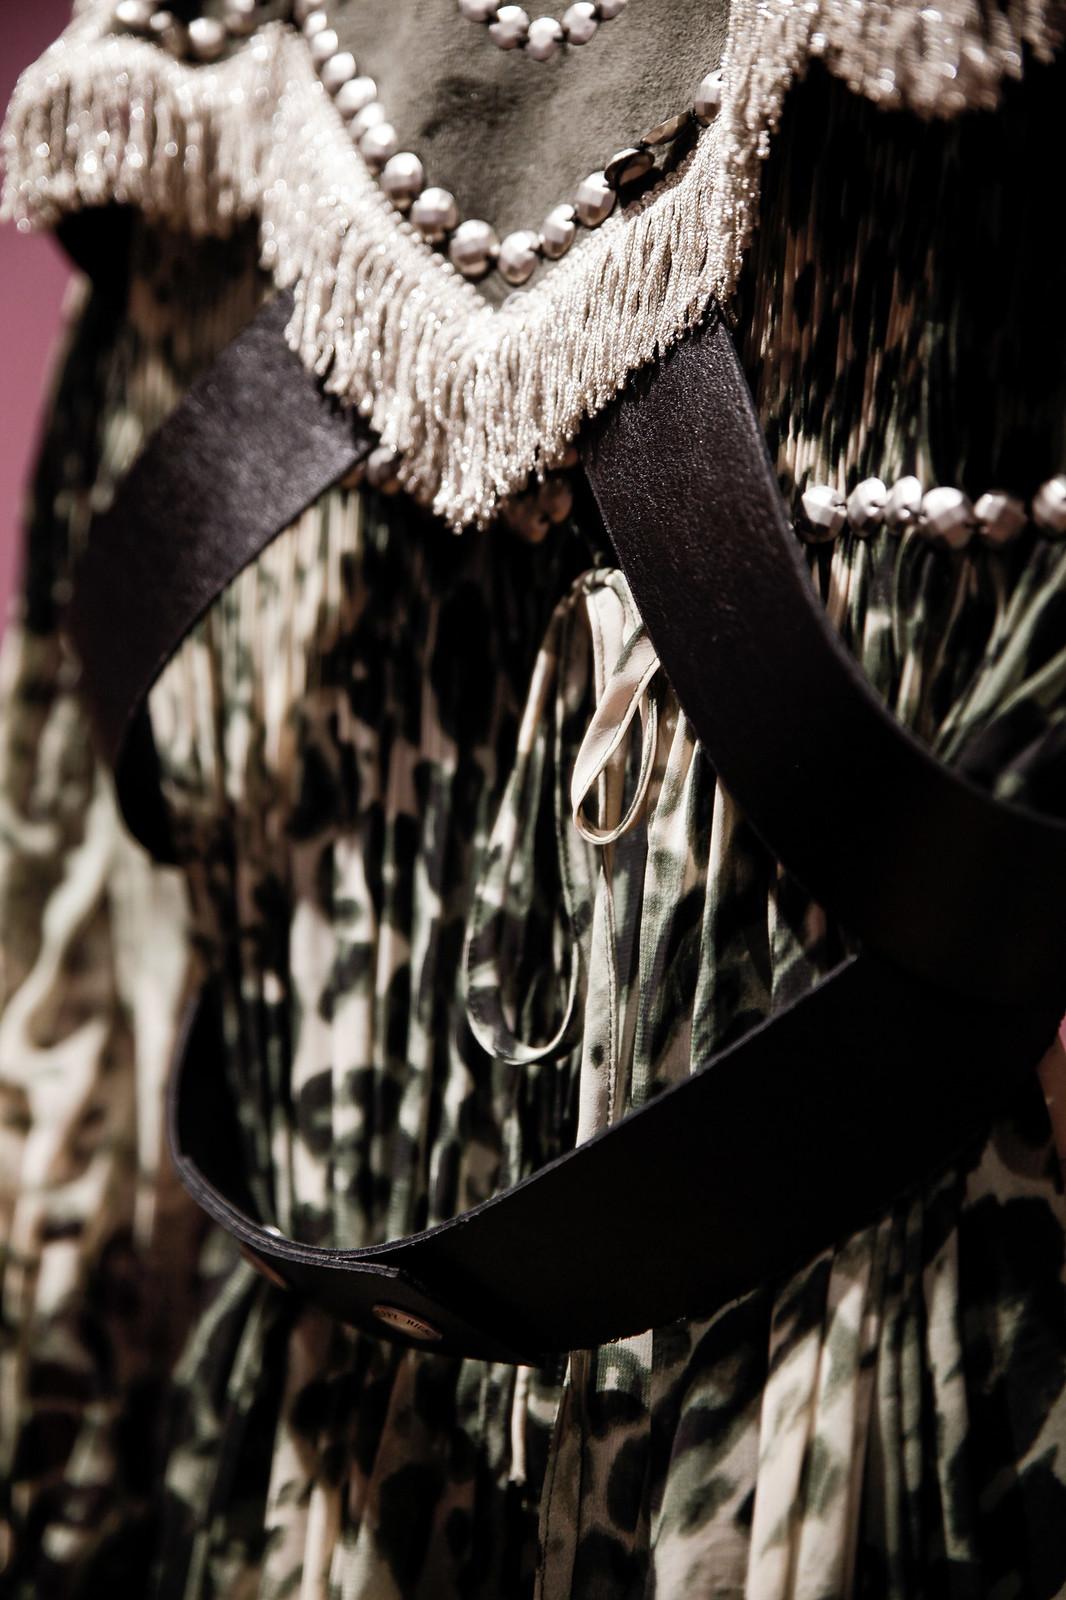 013_Highly_Preppy_abre_su_primera_tienda_en_Bilbao_influencers_fashion_lifestyle_theguestgirl_look_military_khaki_ootd